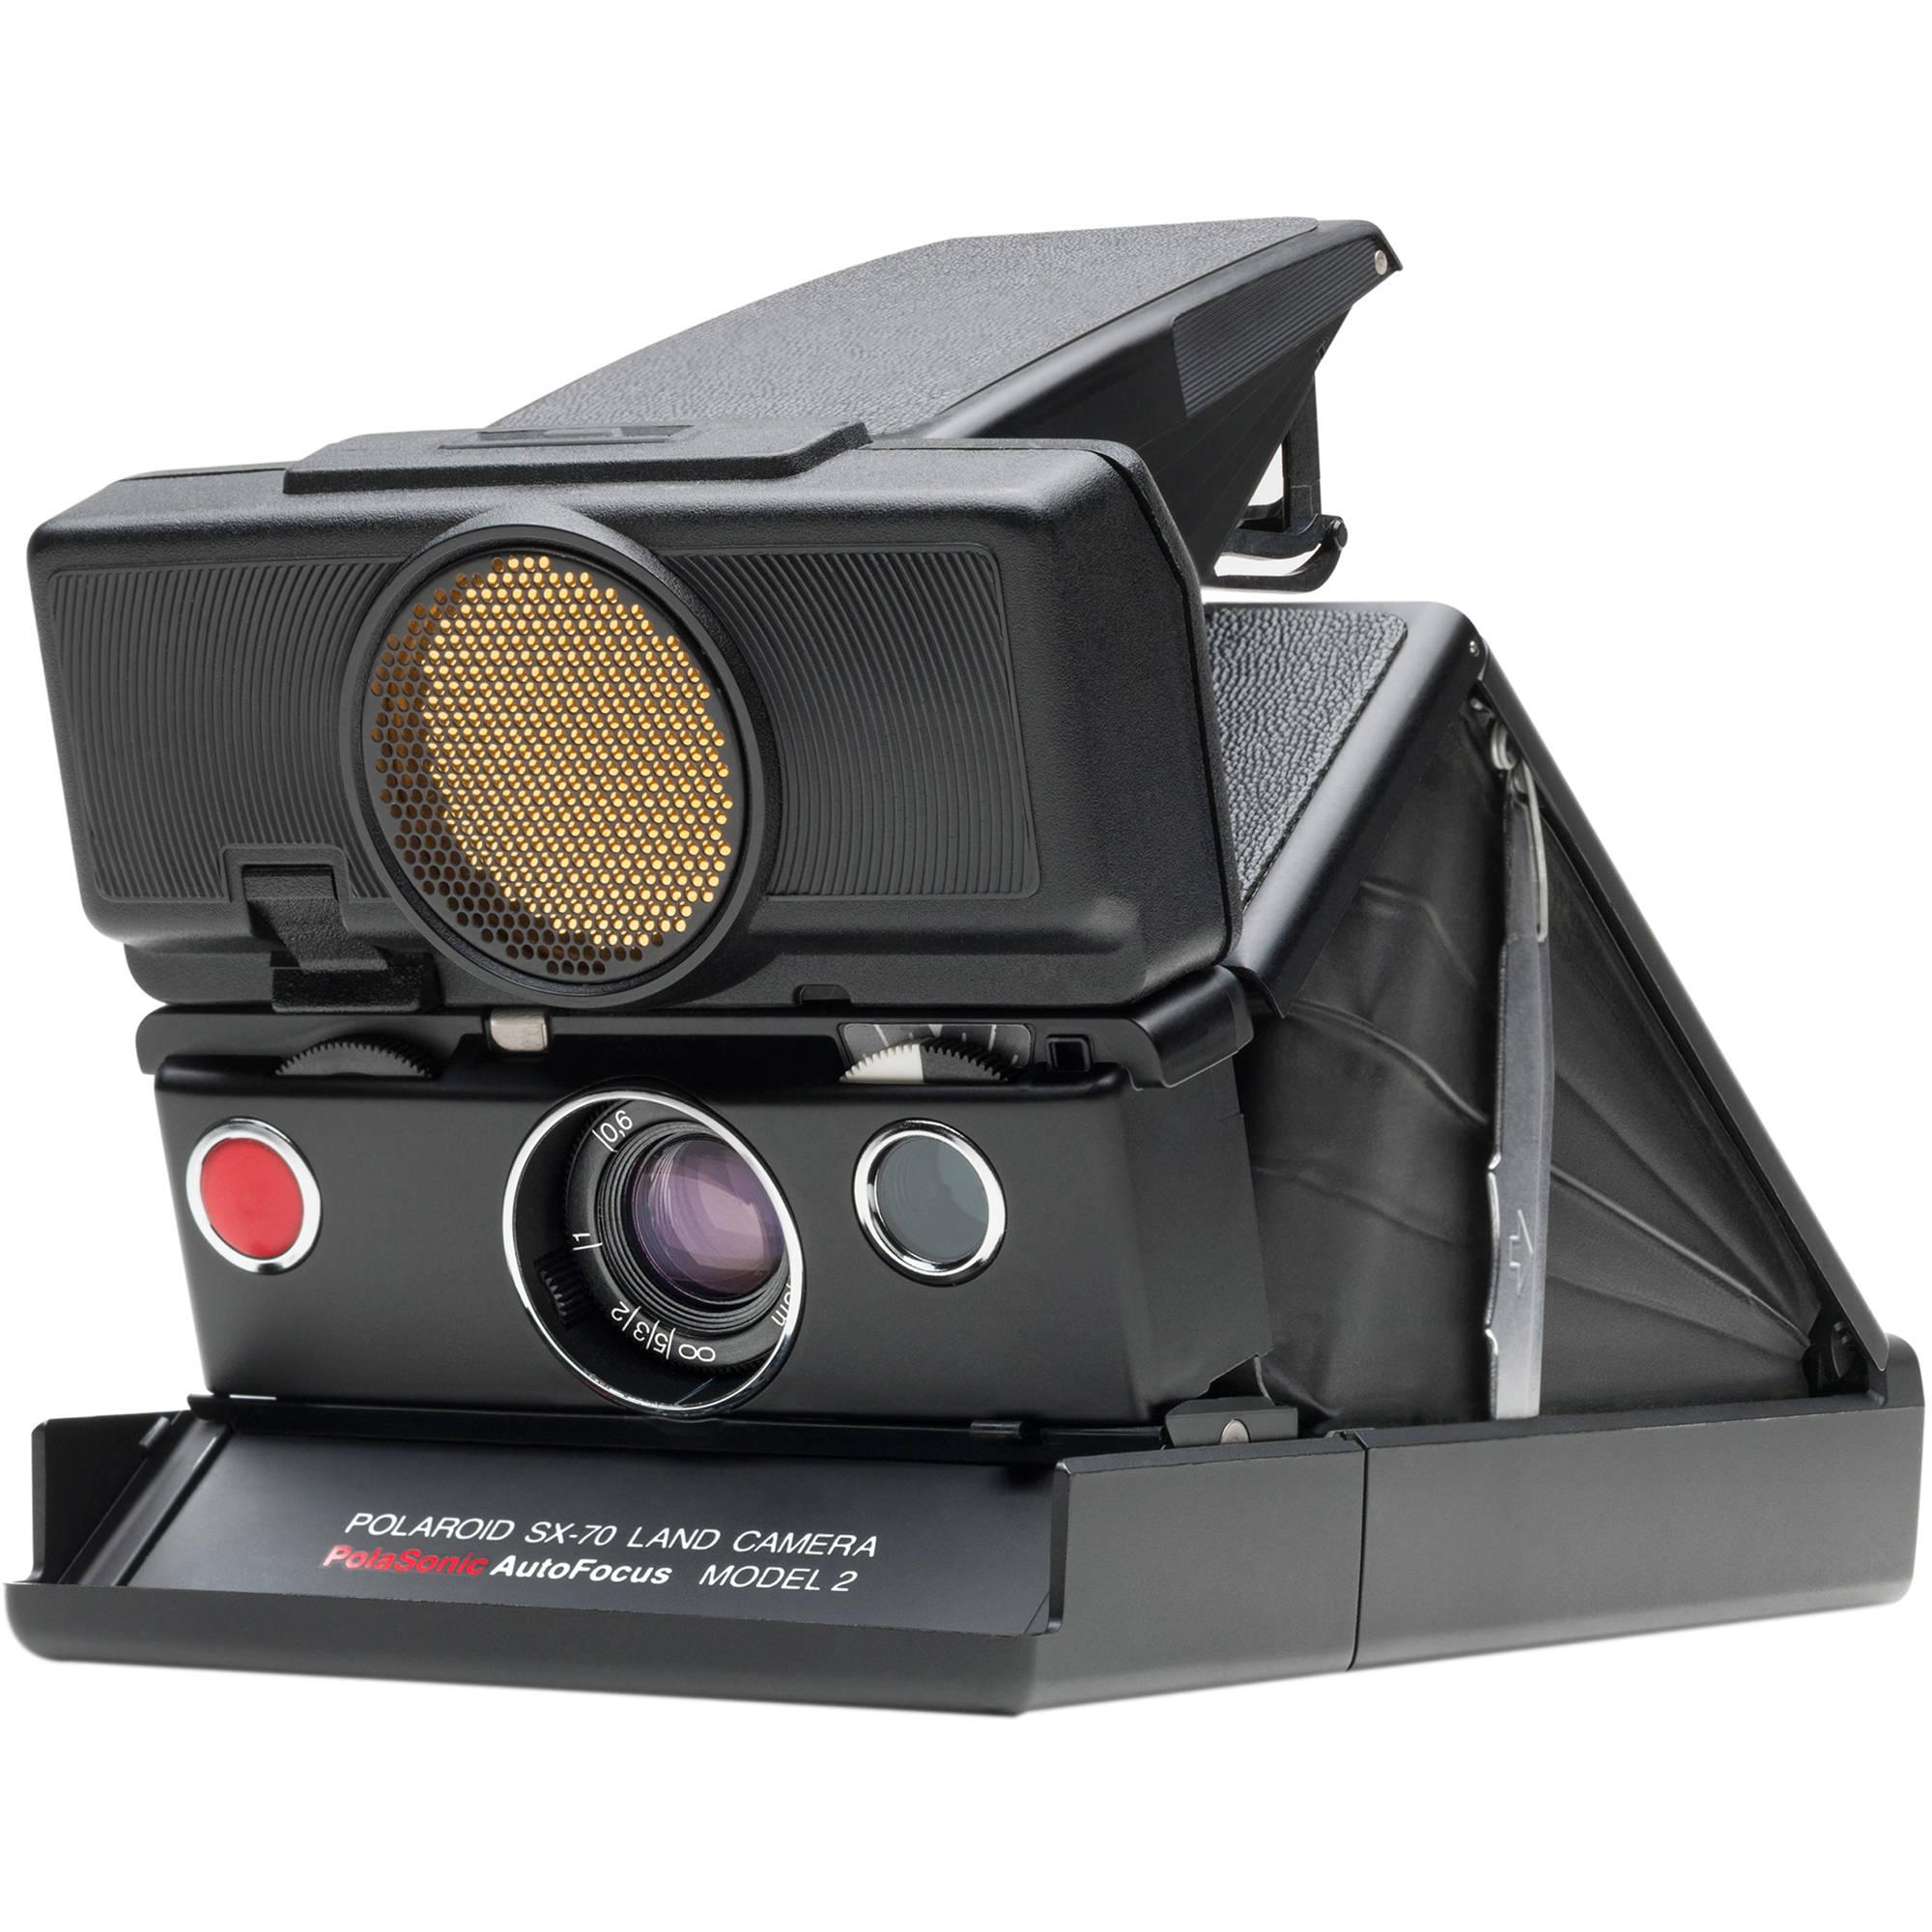 Impossible Polaroid SX-70 Sonar Instant Film Camera (Black)